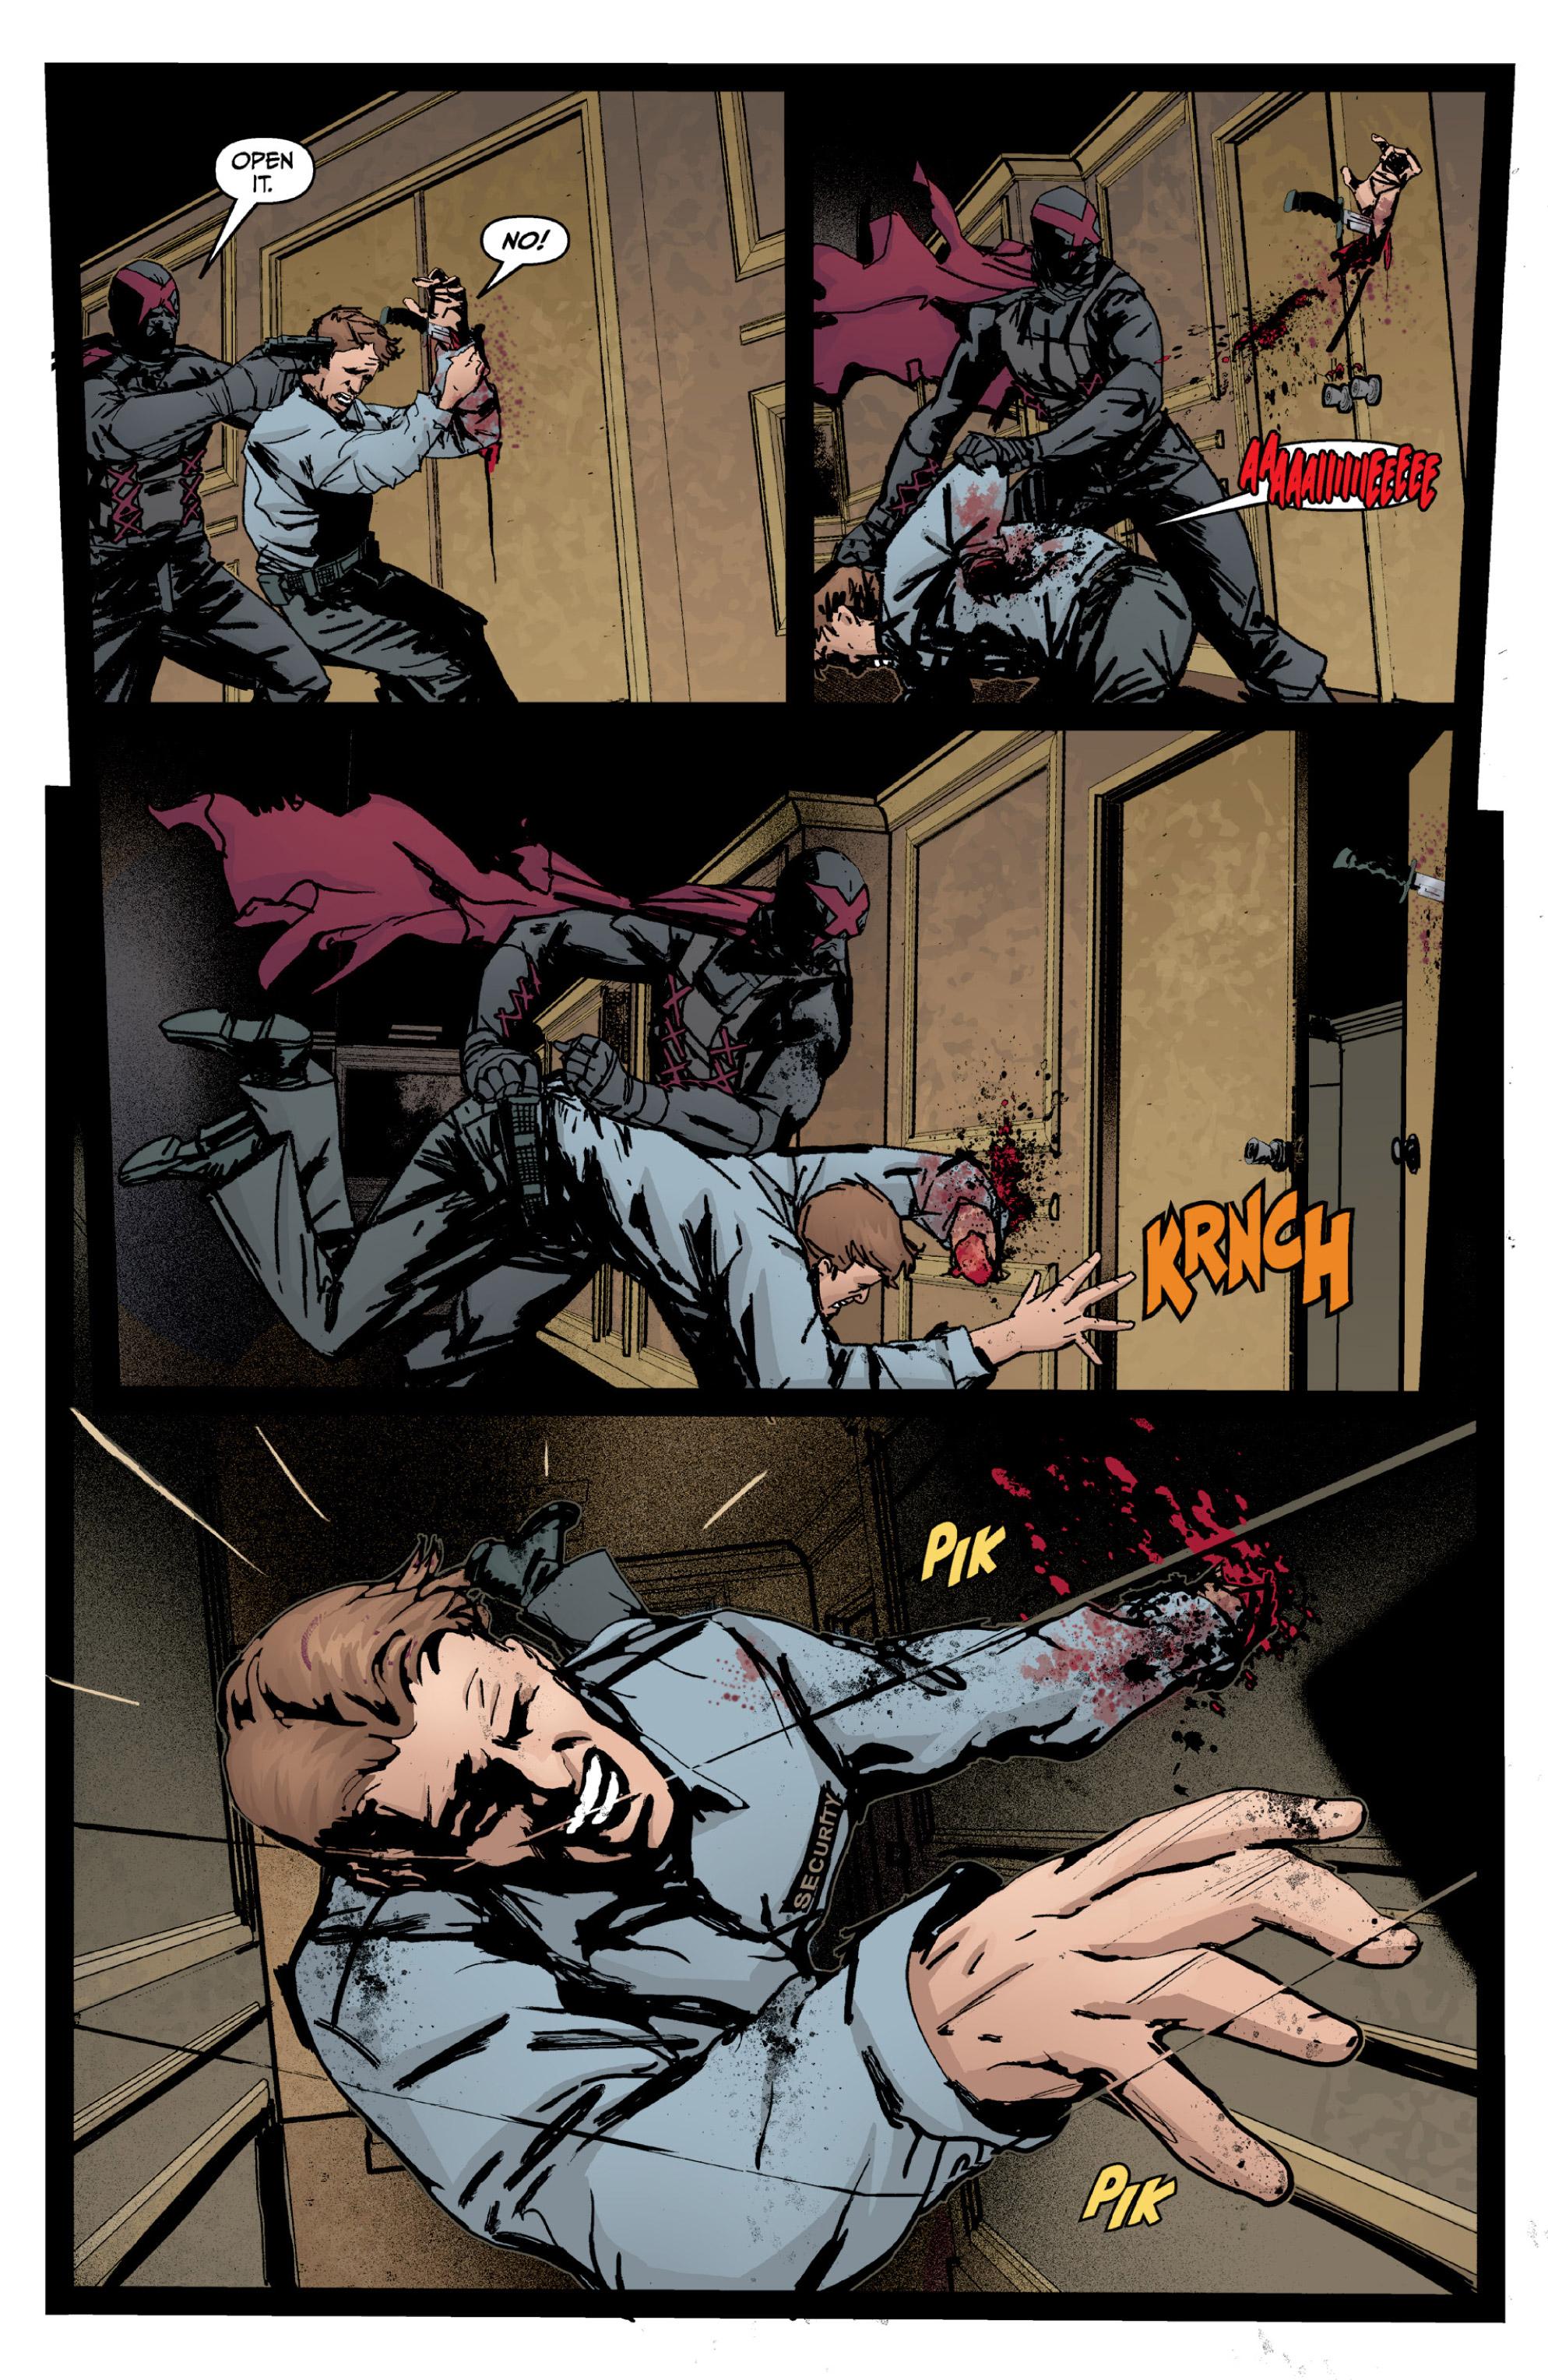 Read online X: Big Bad comic -  Issue # Full - 50